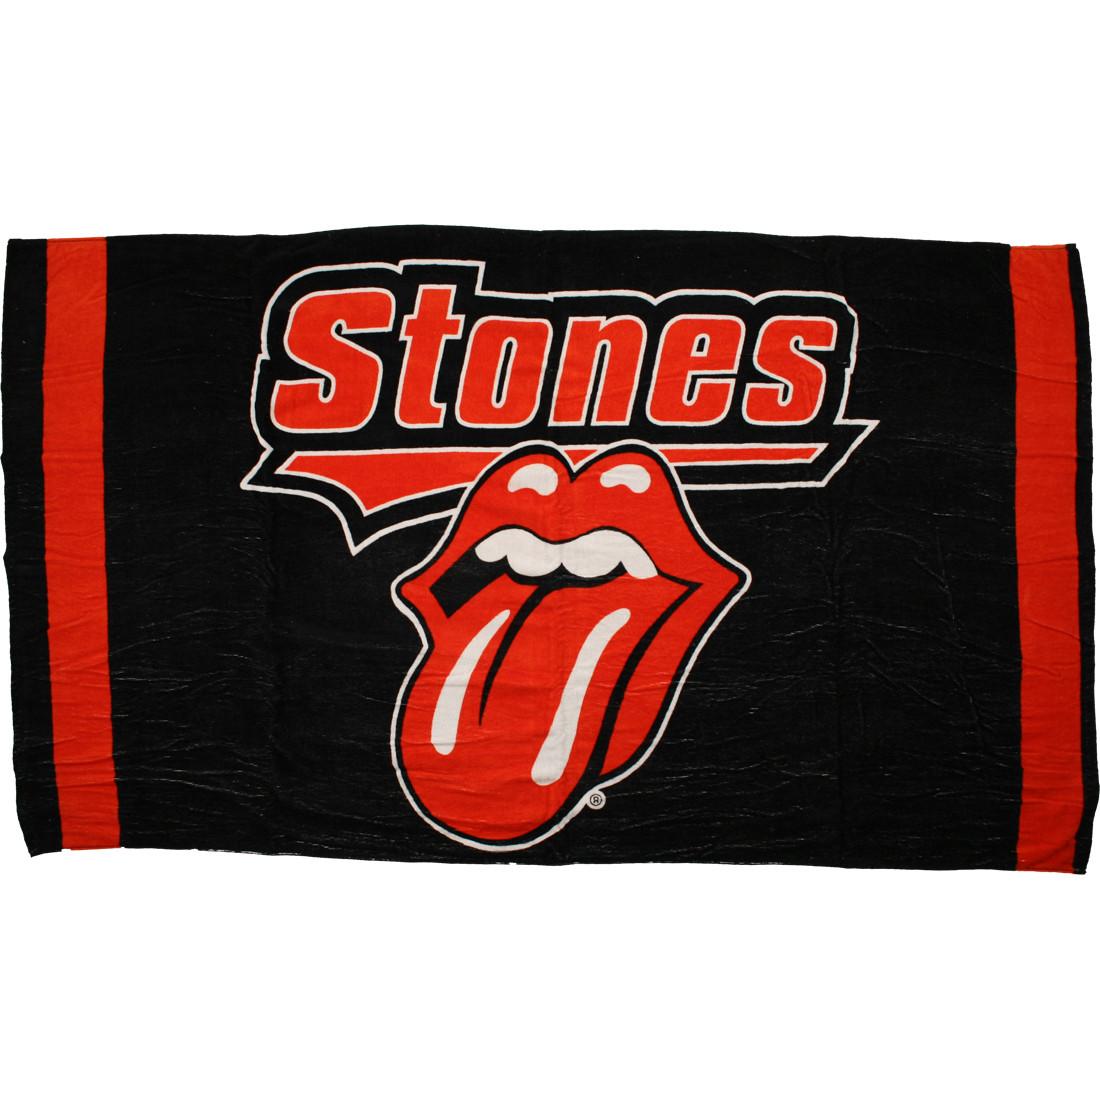 Rolling Stones Beach Towel